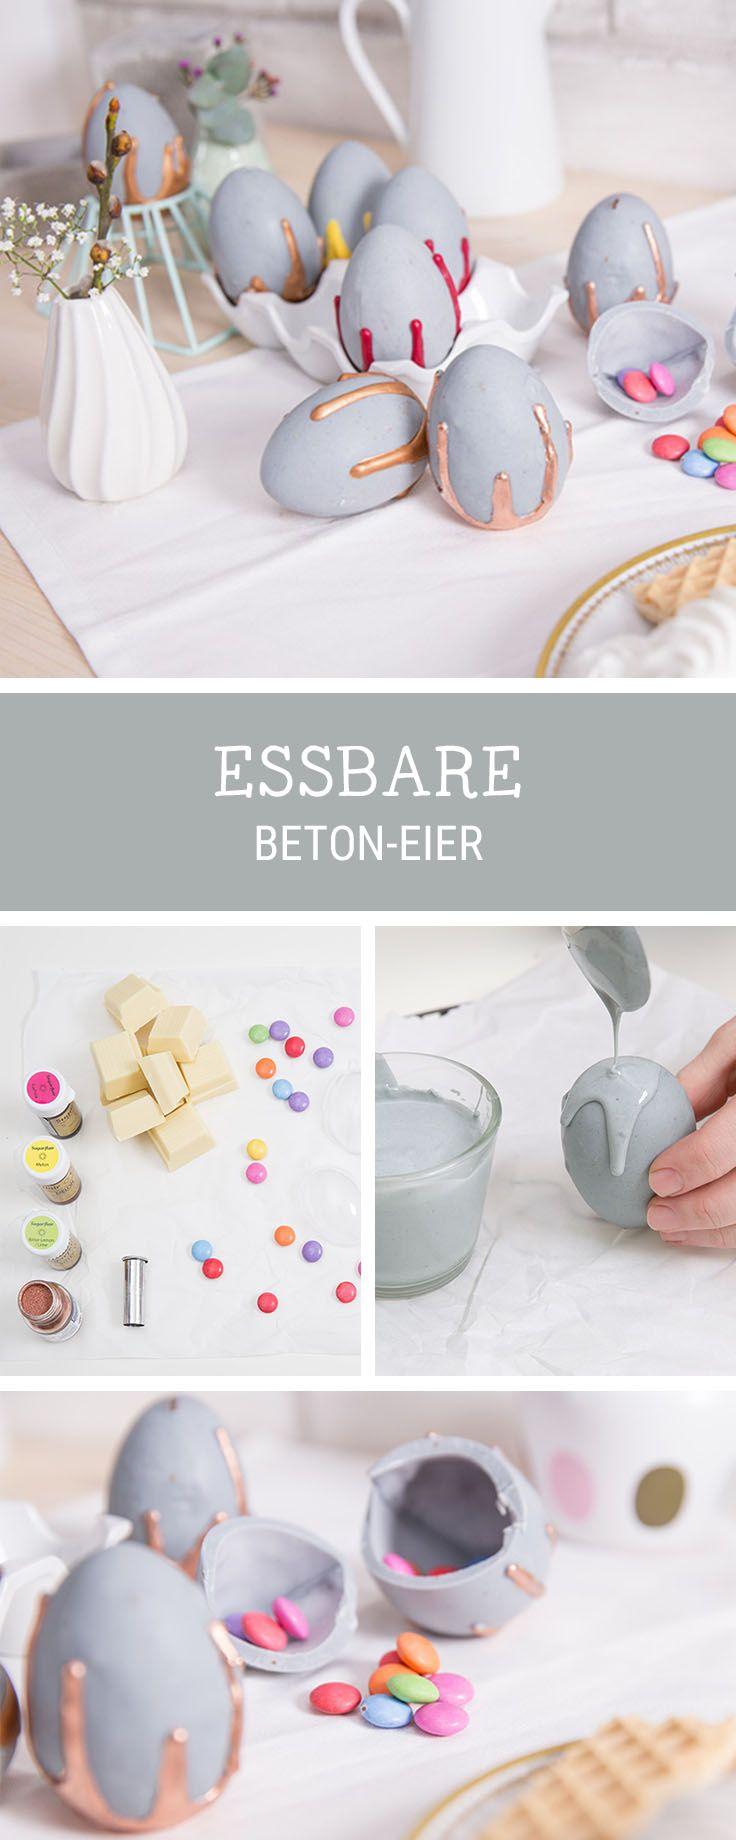 Rezeptidee für Ostern: Gefüllte Schoko-Ostereier in Beton-Optik / funny Easte recipe: filled chocolate eggs via DaWanda.com